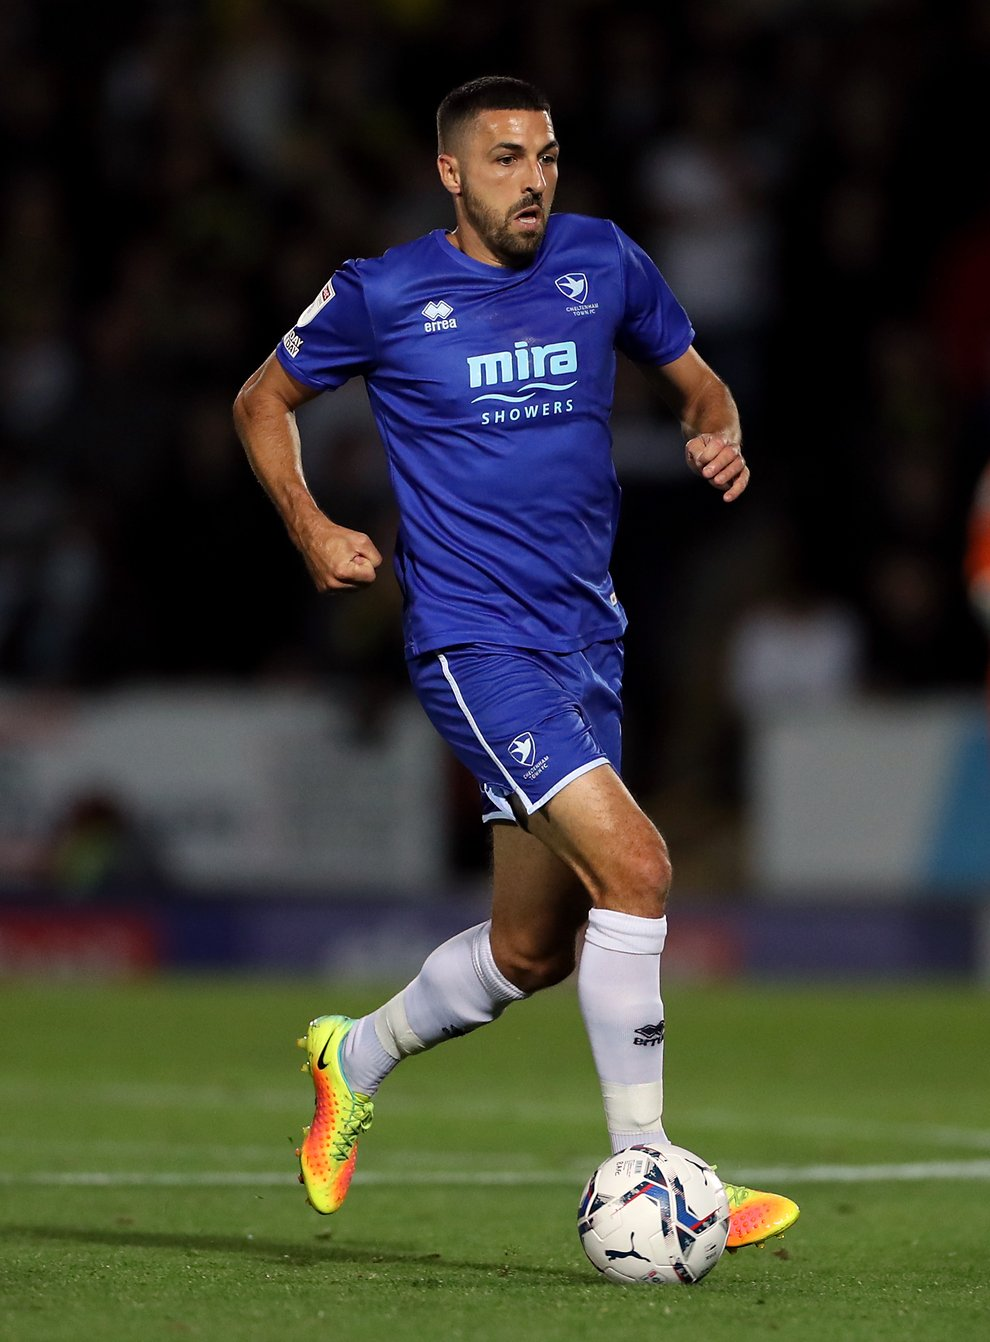 Liam Sercombe will be missing for Cheltenham (Bradley Collyer/PA)